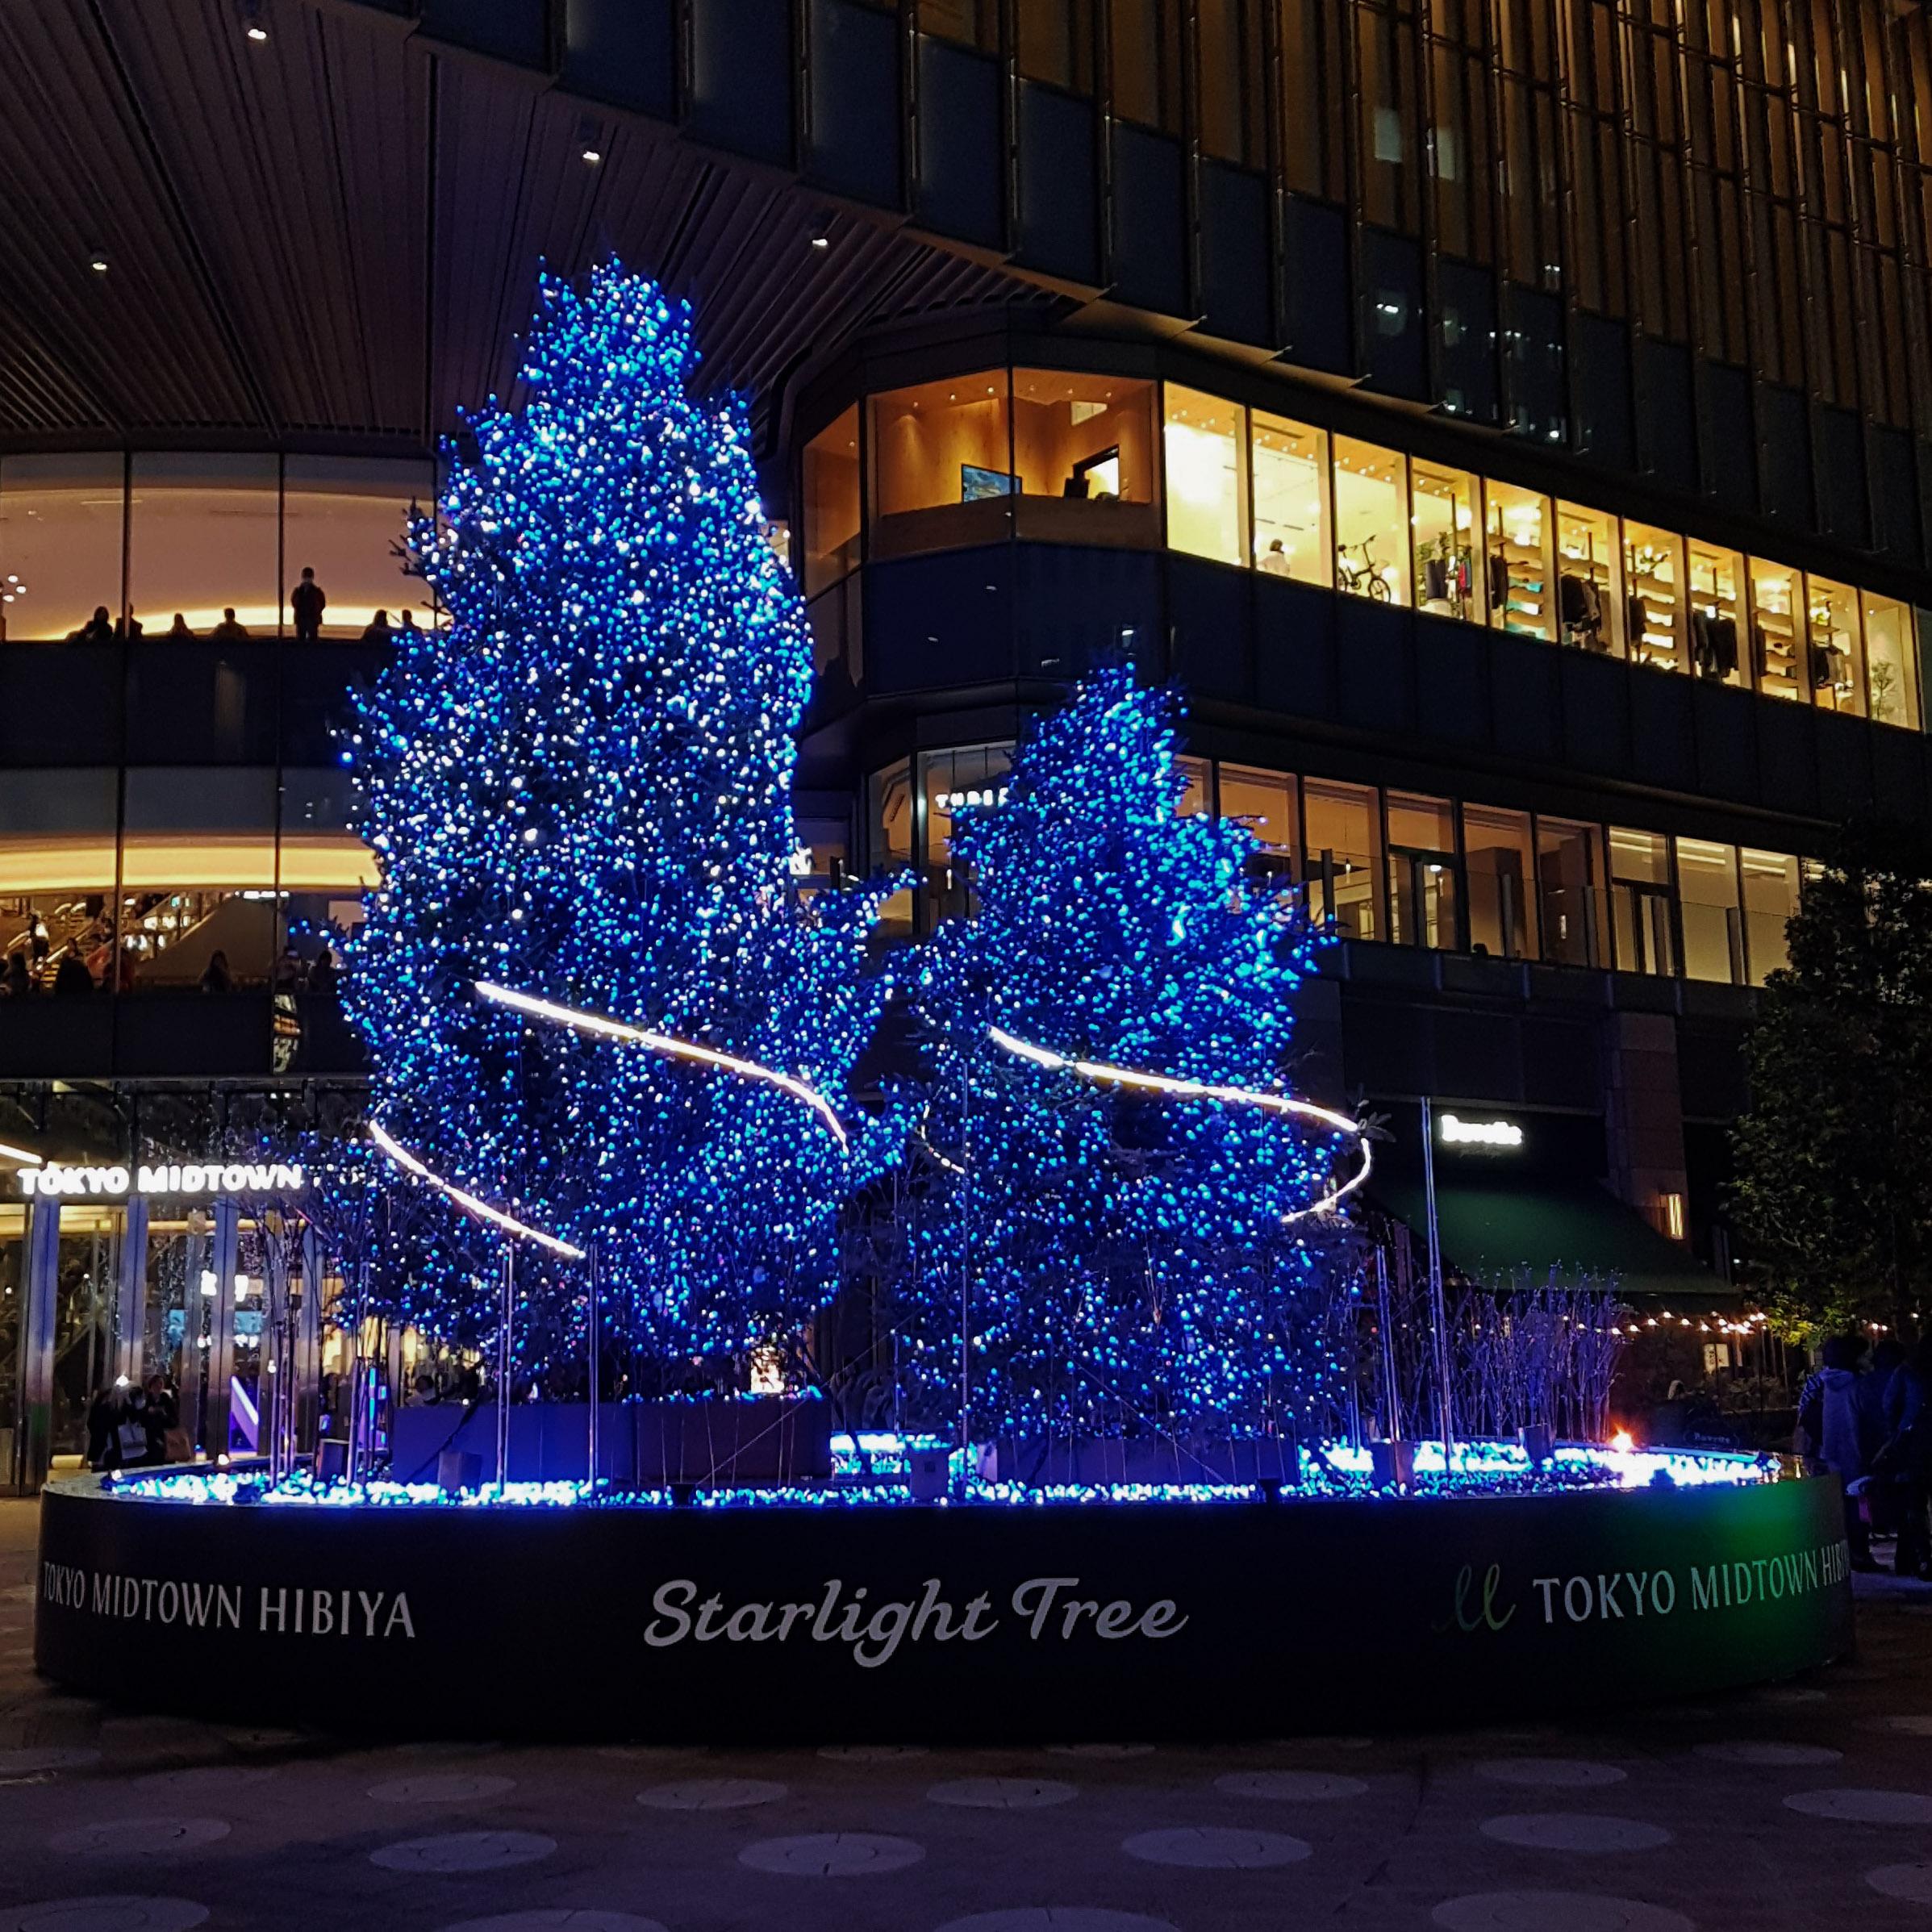 starlight tree winter illuminations